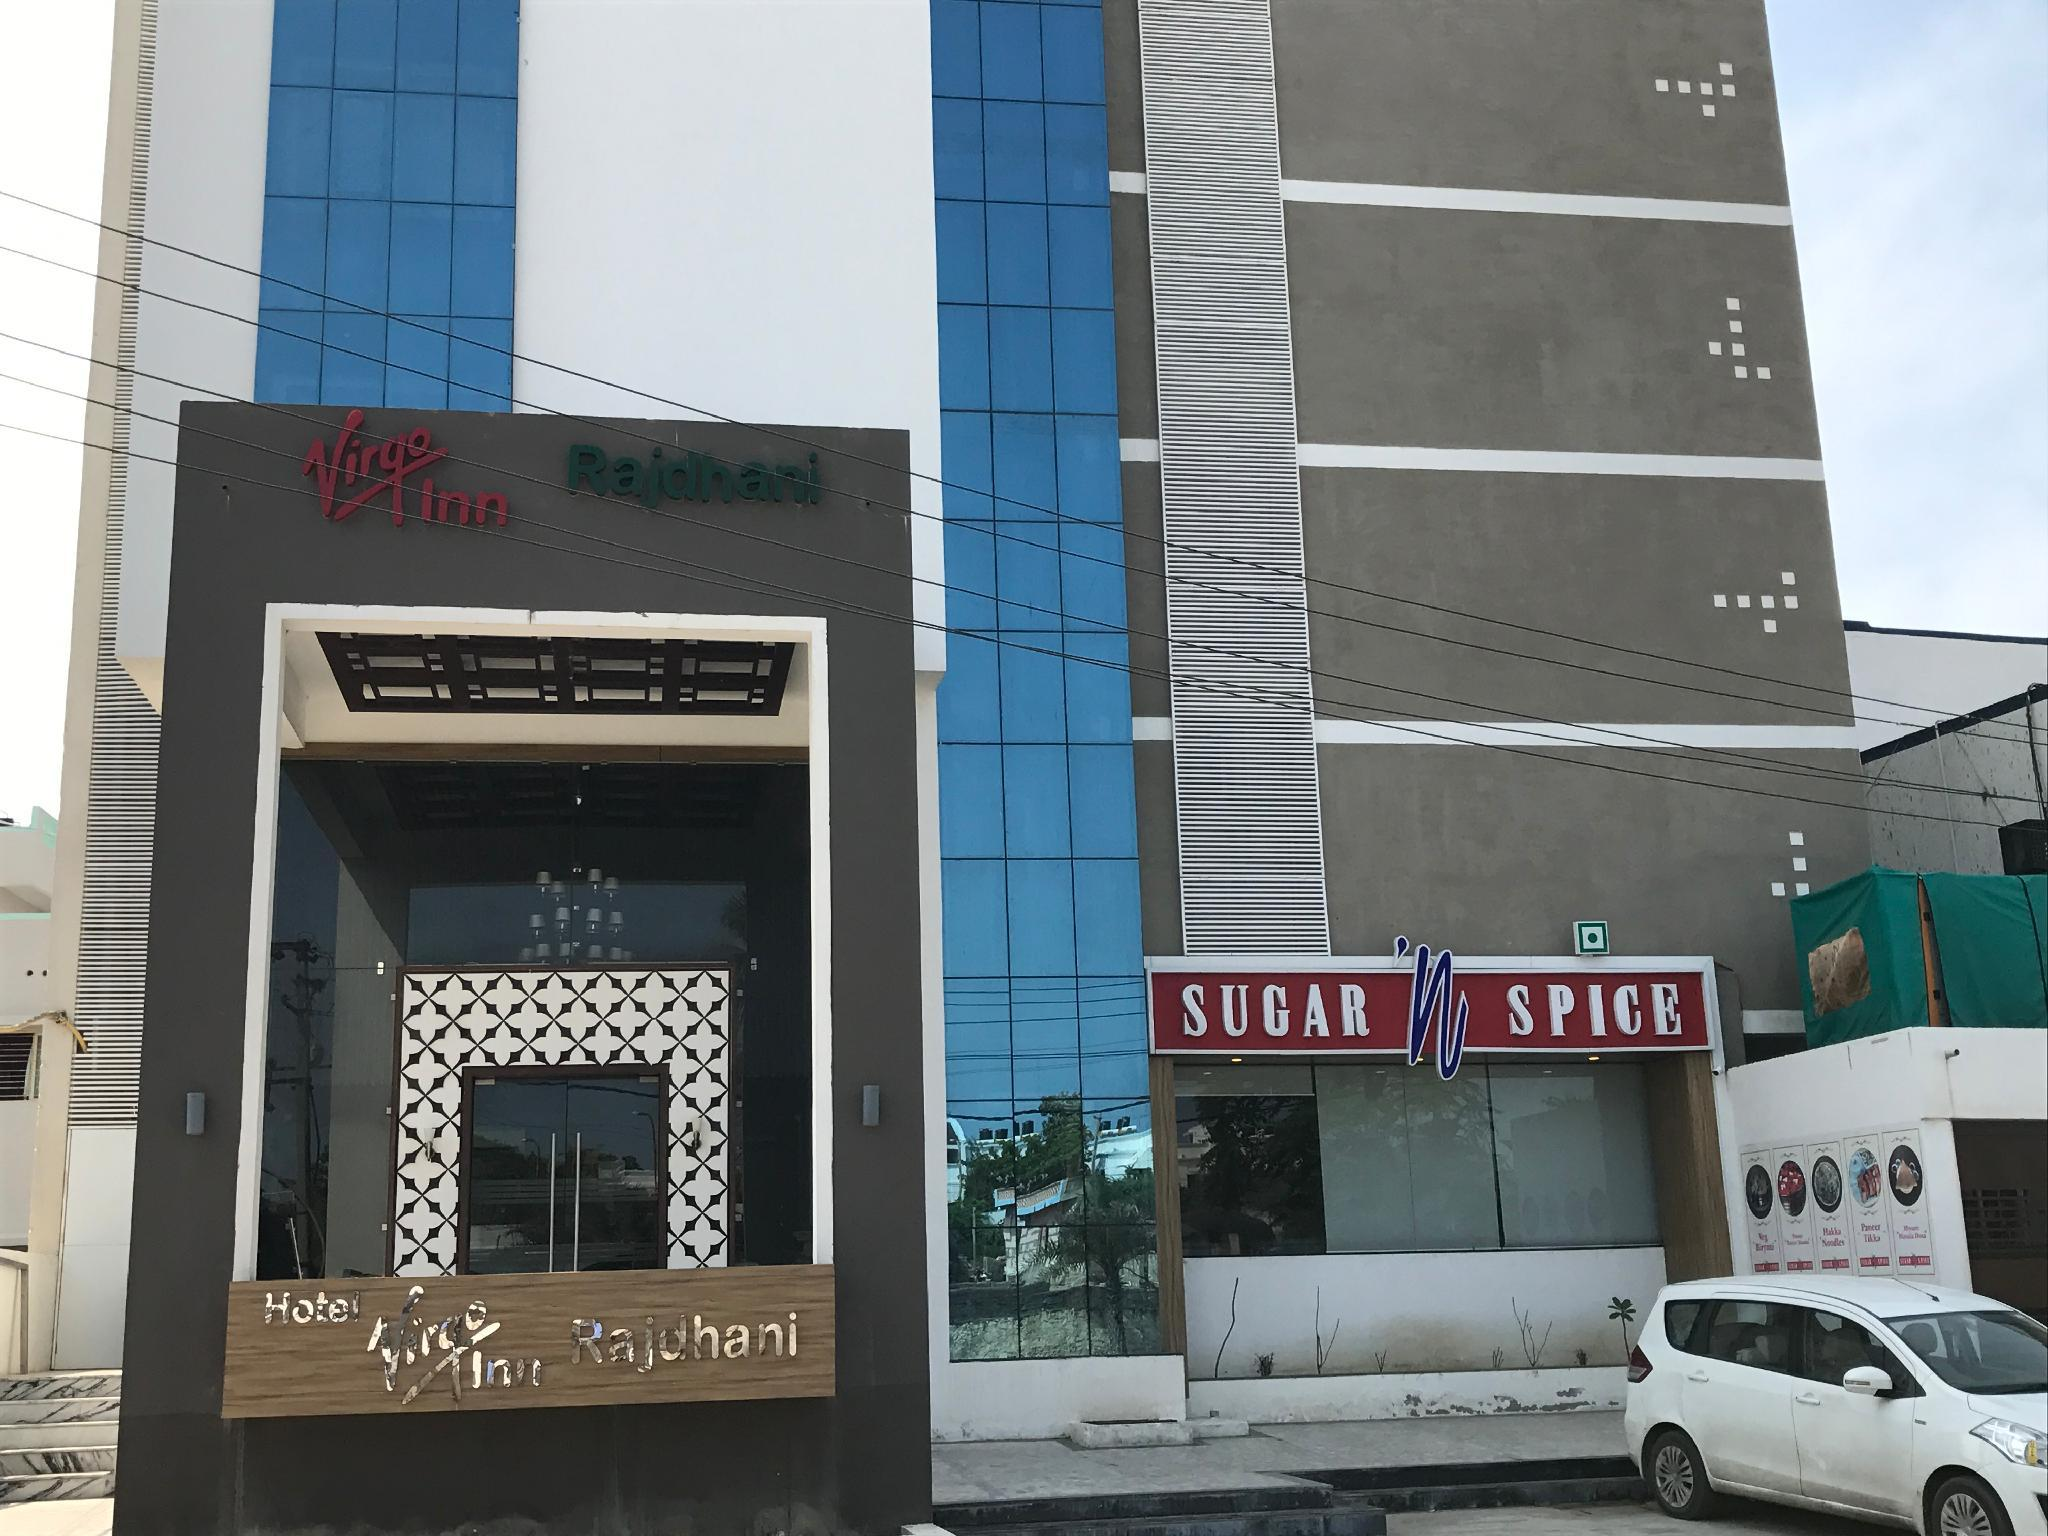 Virgo Inn Rajdhani